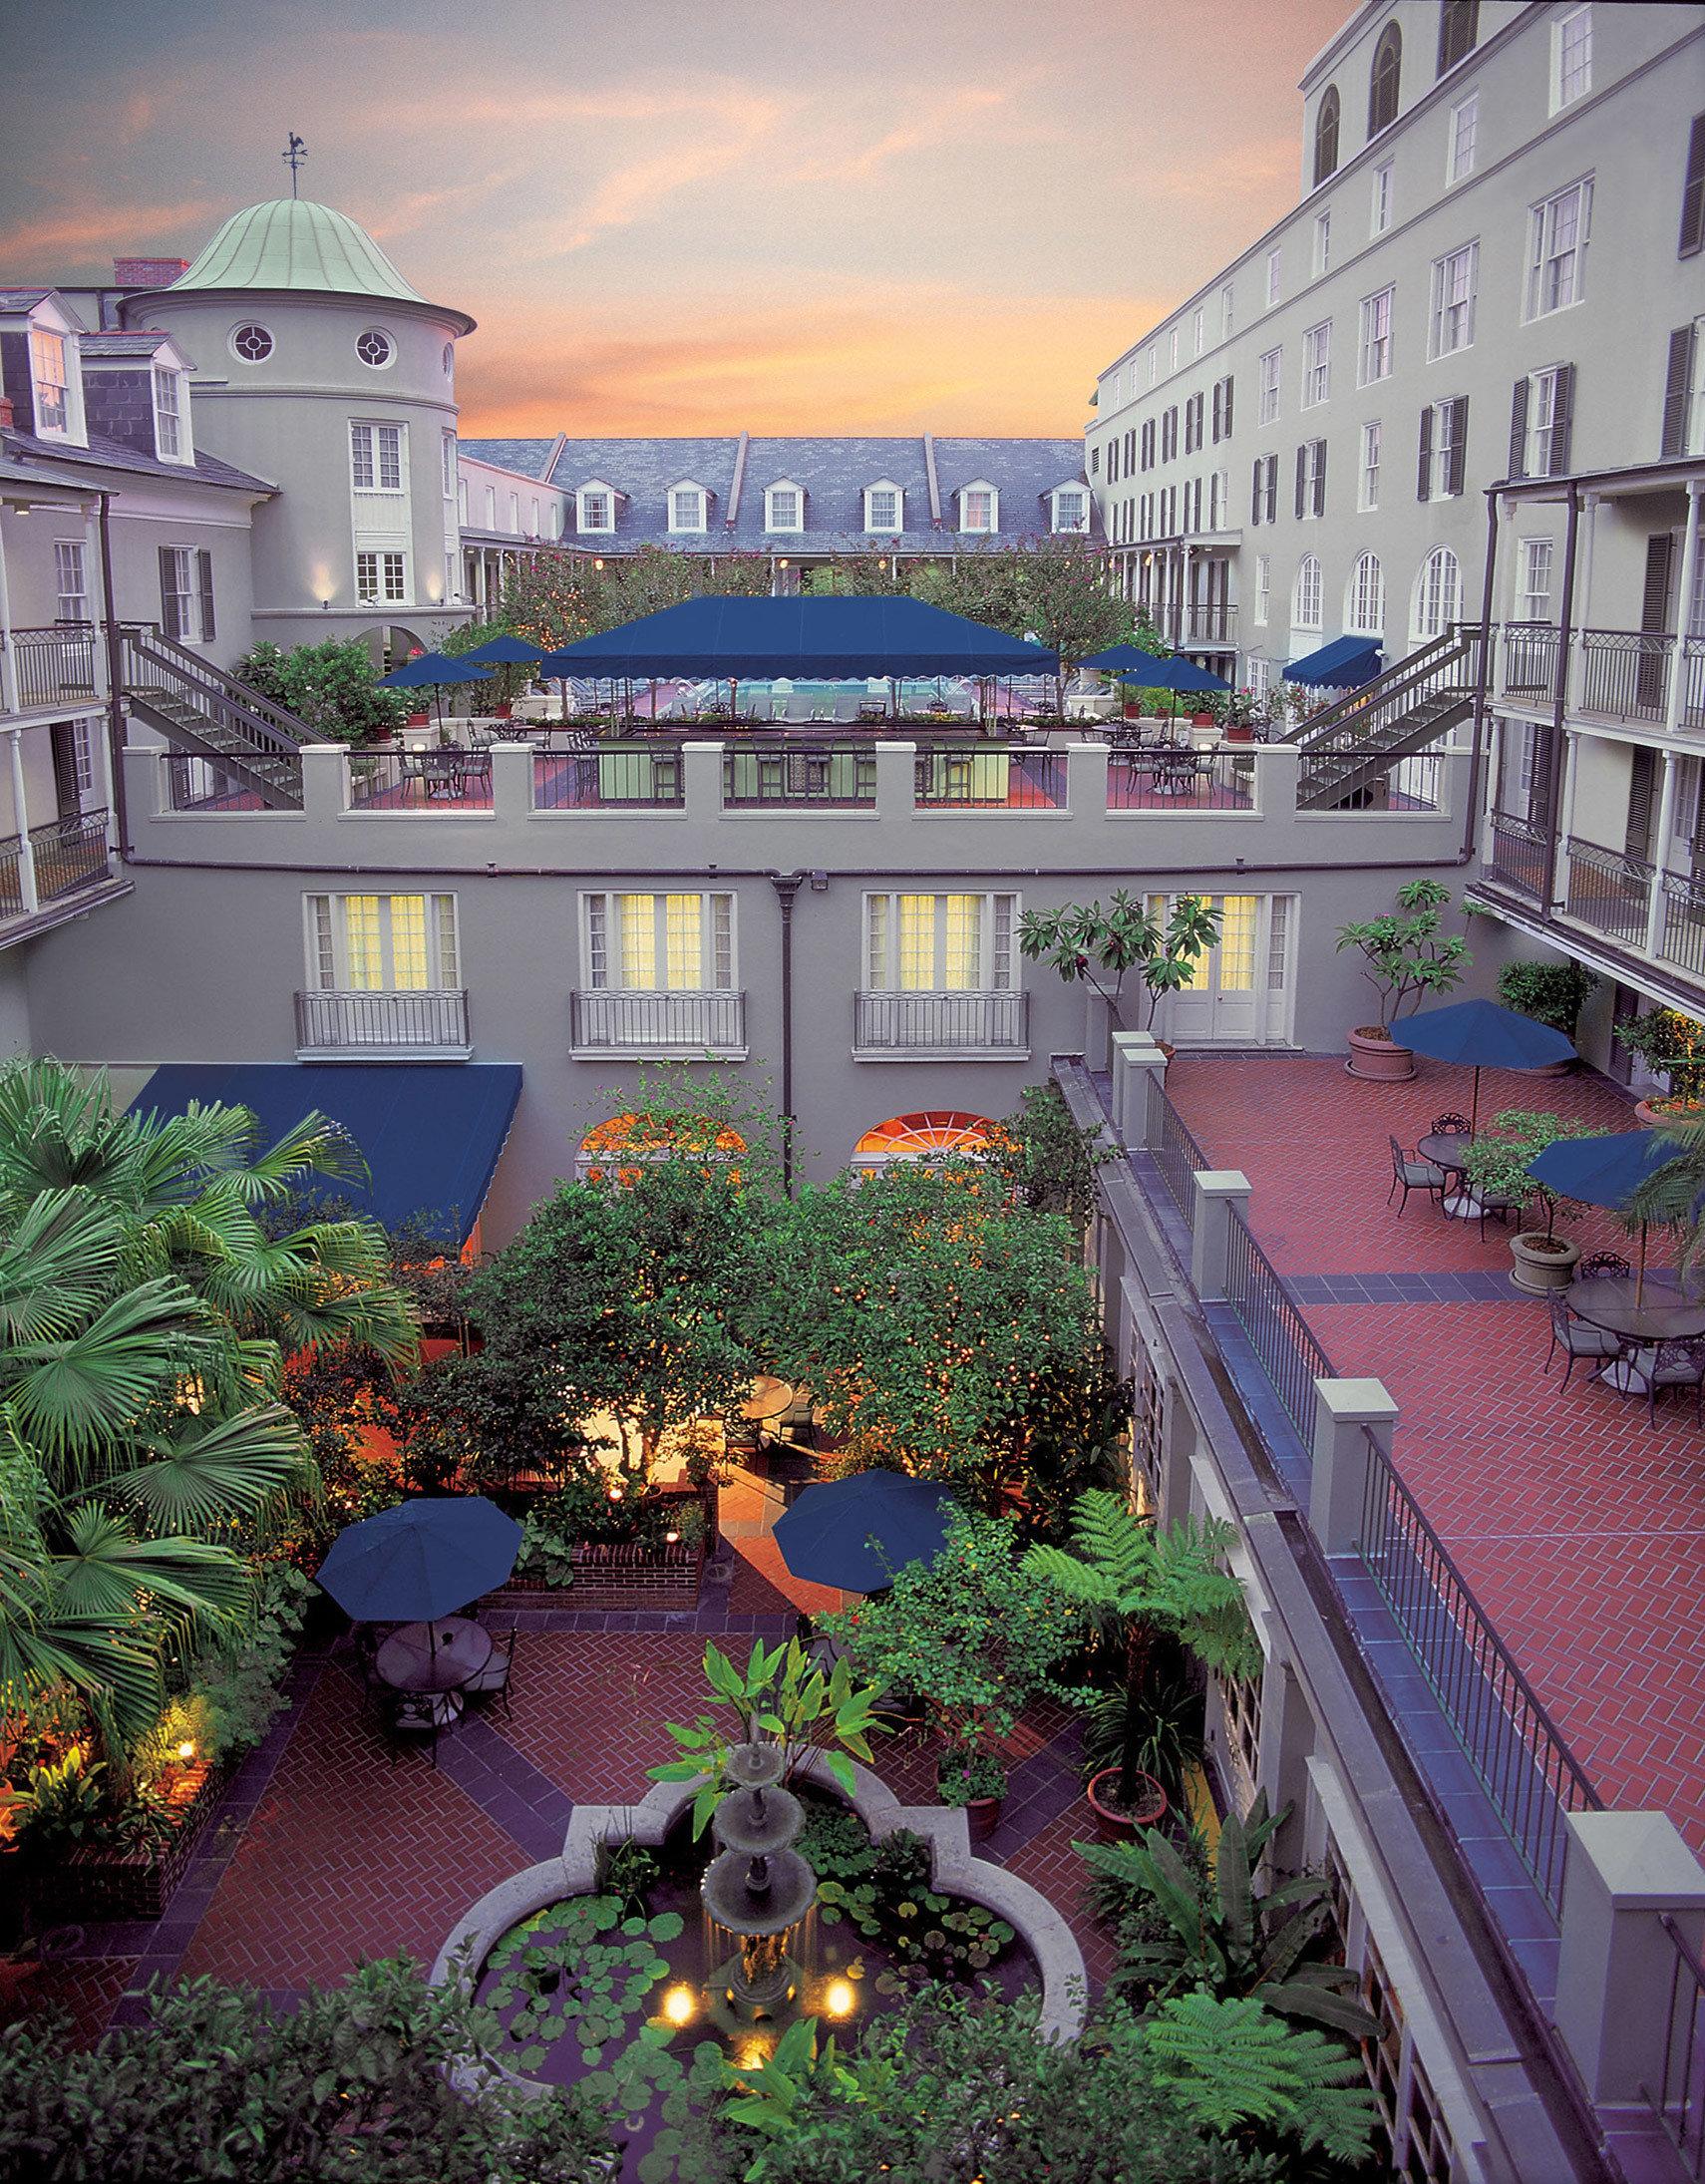 City neighbourhood condominium plaza waterway Resort cityscape Courtyard walkway flower Garden